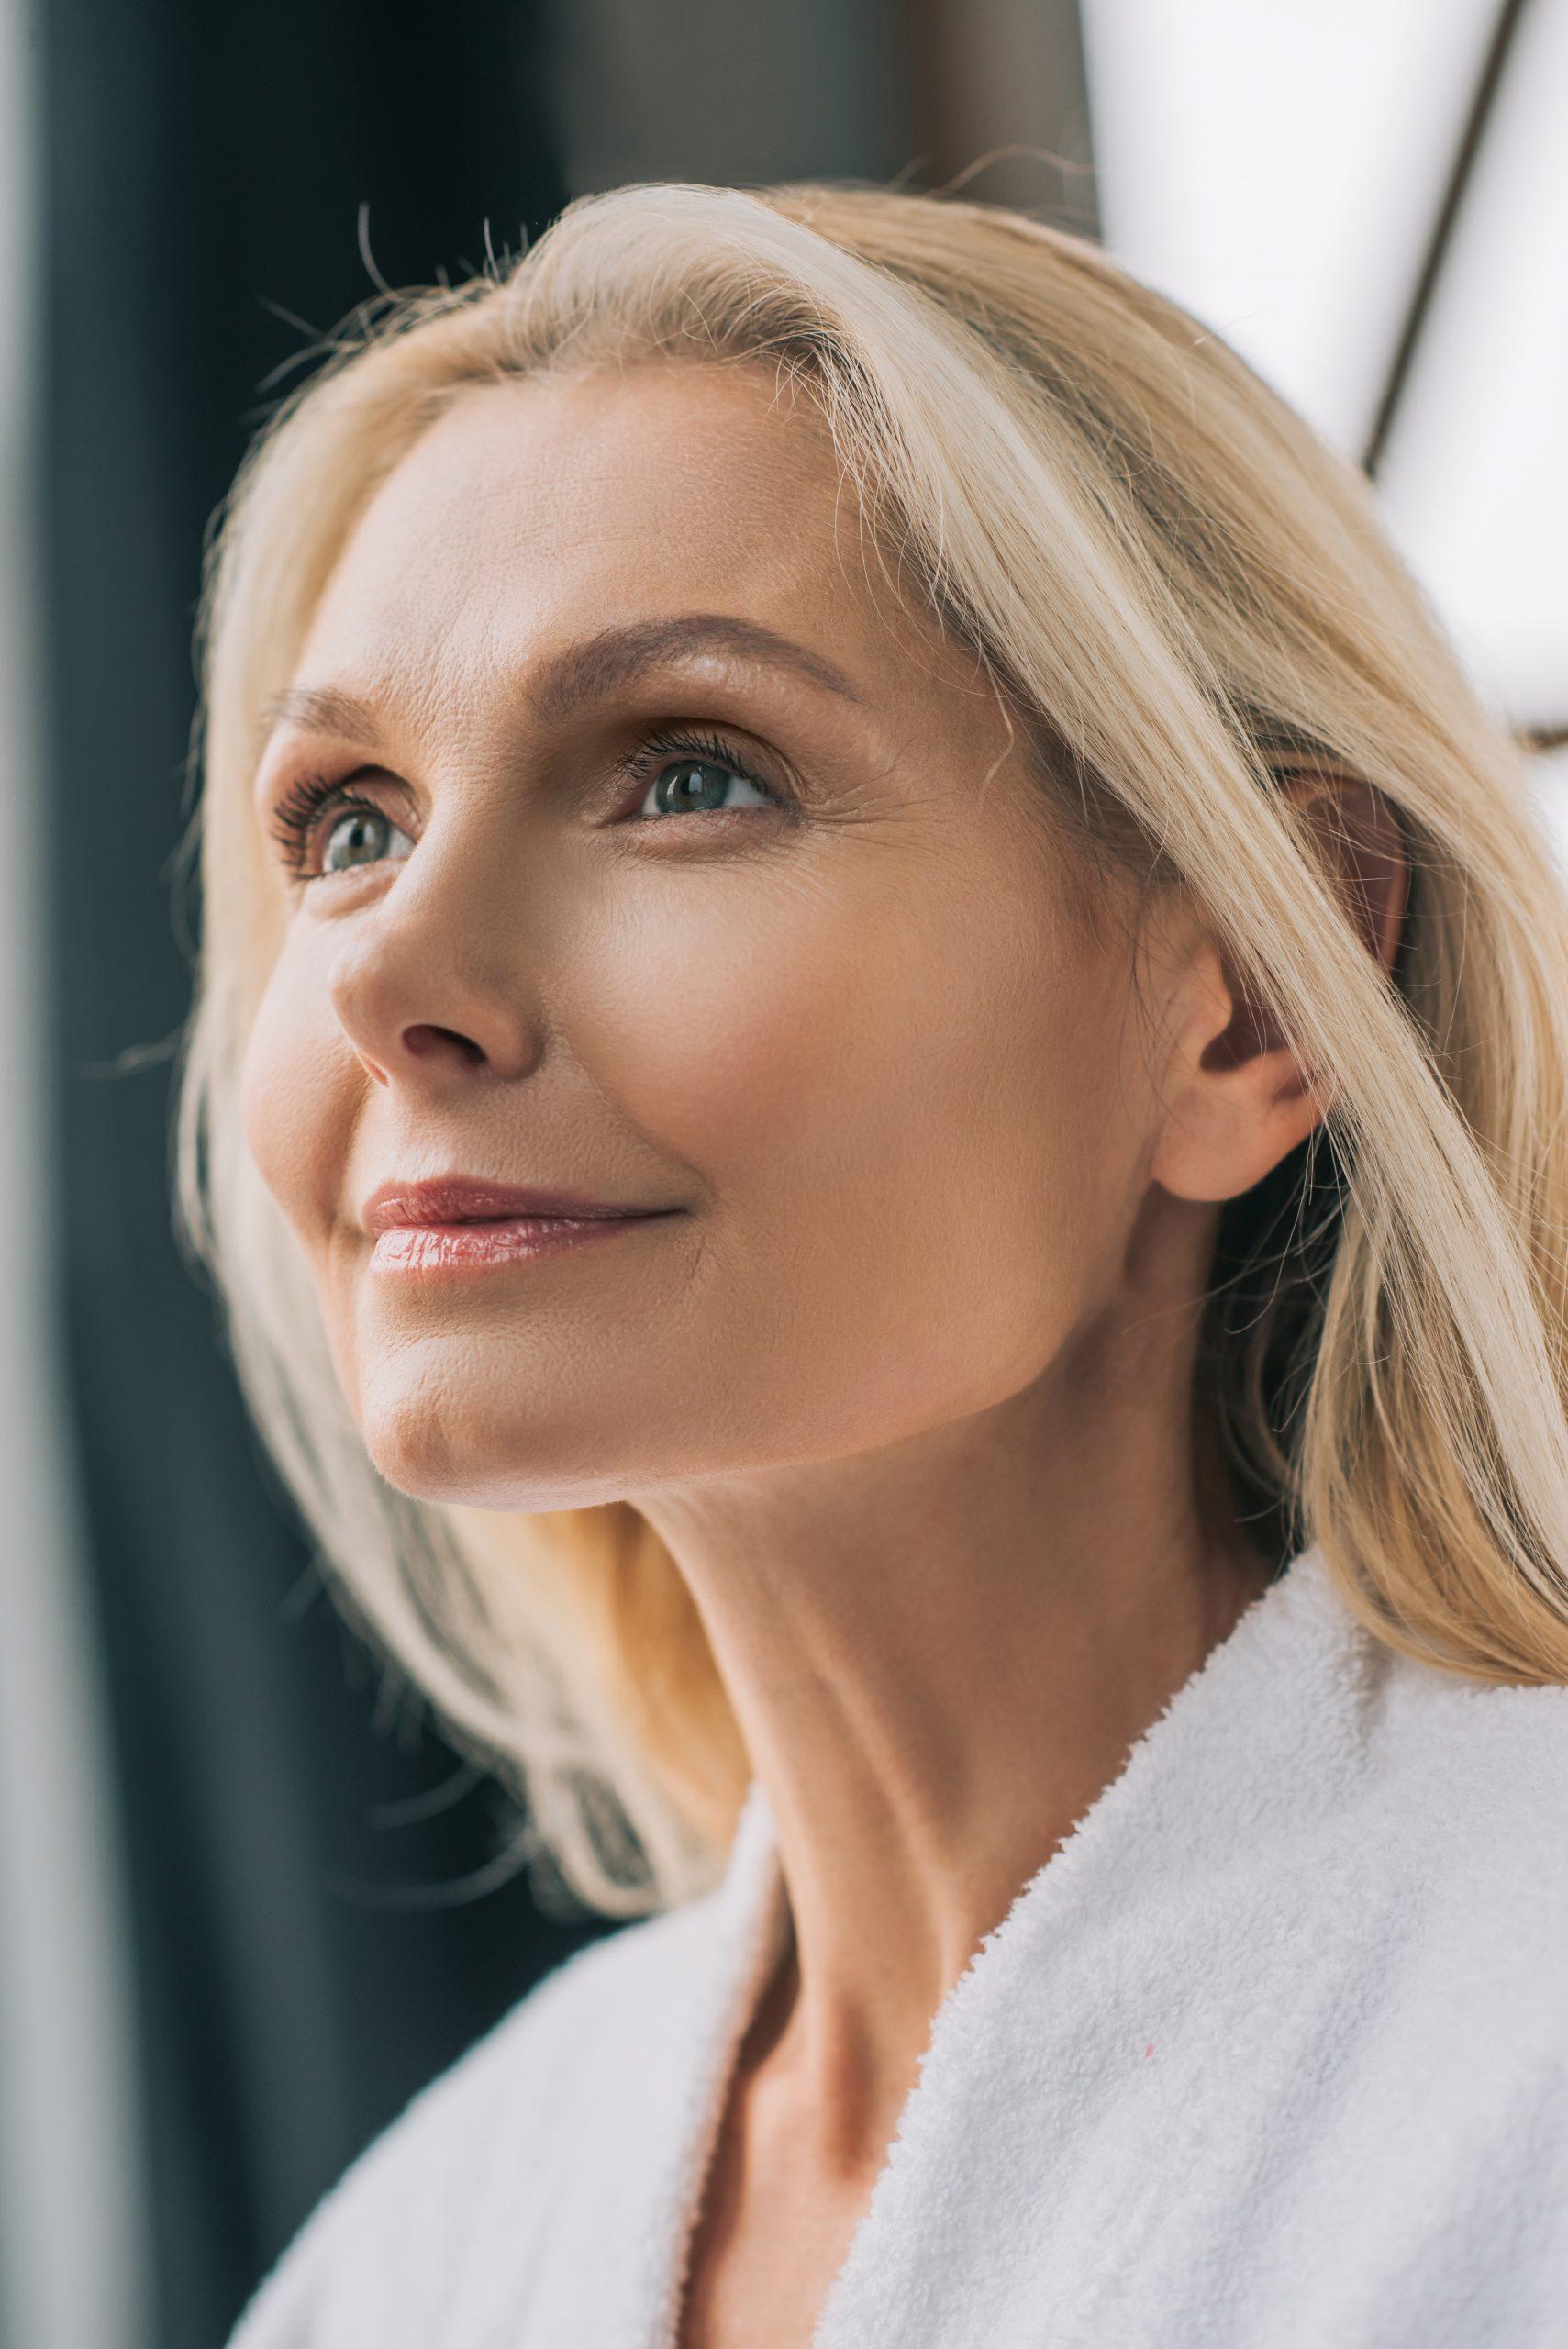 close-up-portrait-of-beautiful-mature-woman-8ret4k4-scaled